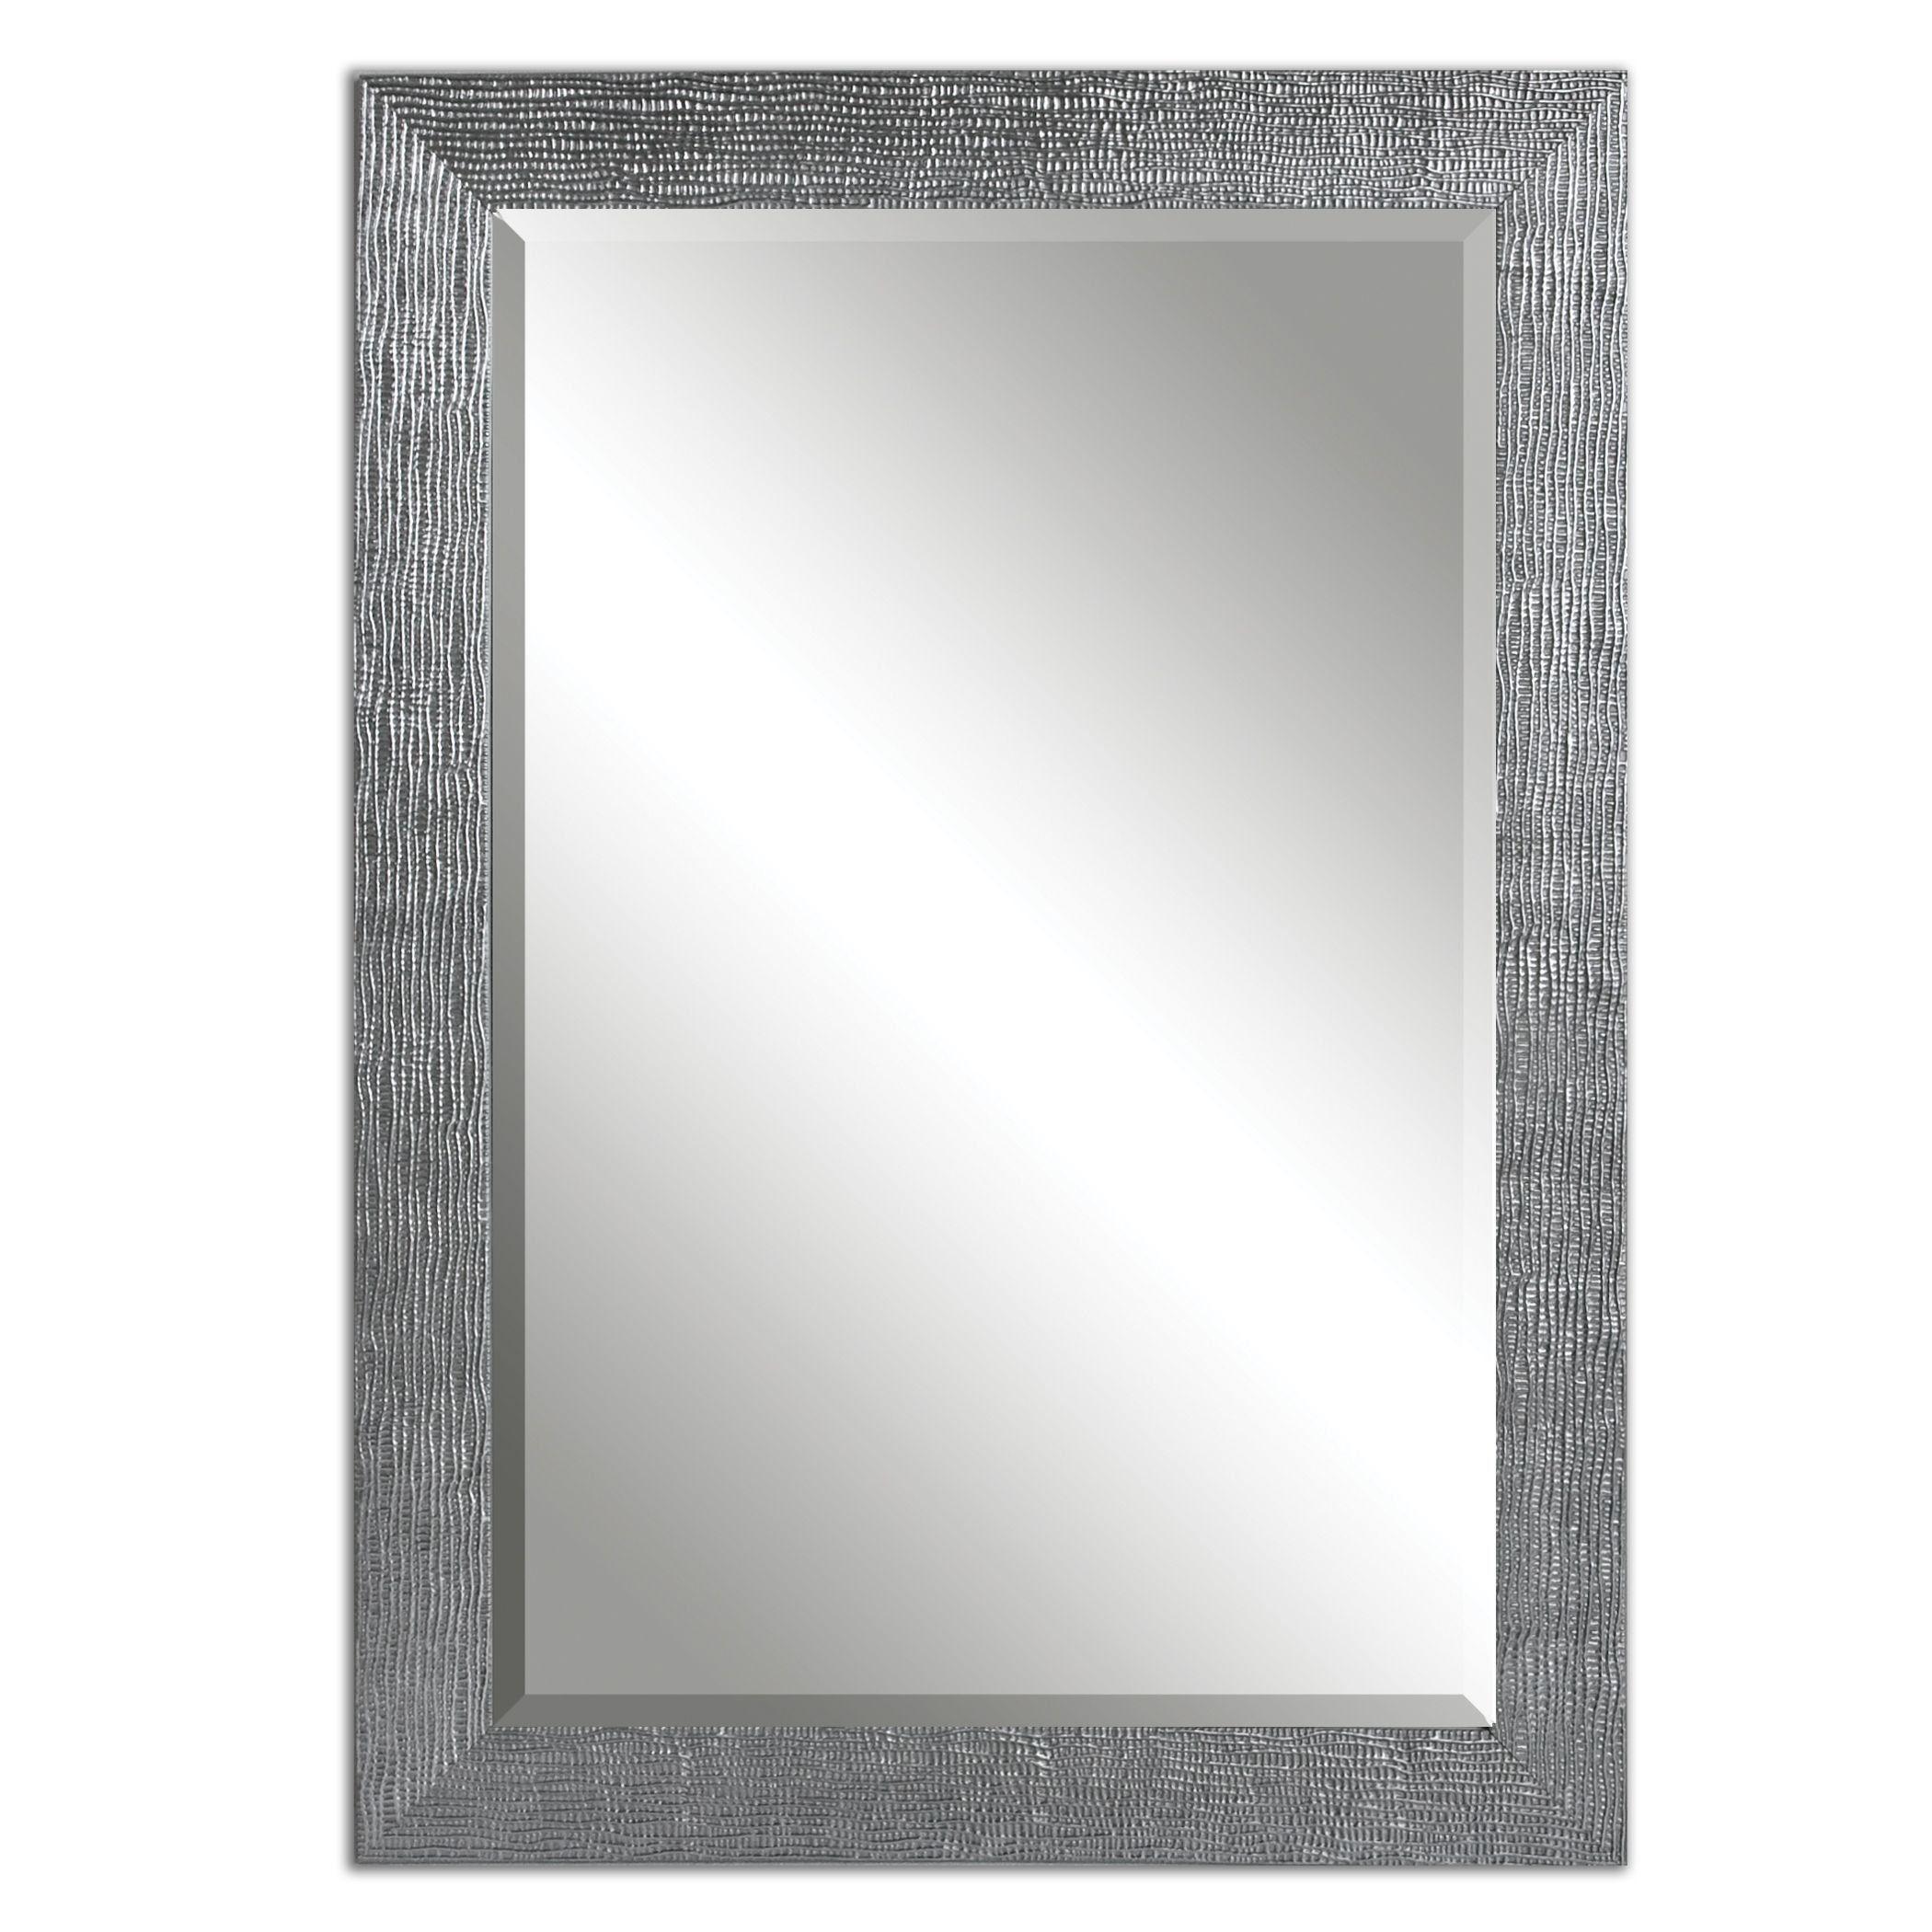 Diamond Freshfit Calhoun 42 In X 34 In White Rectangular Framed Bathroom Mirror Rectangular Bathroom Mirror Bathroom Mirror Lowes Bathroom Mirrors